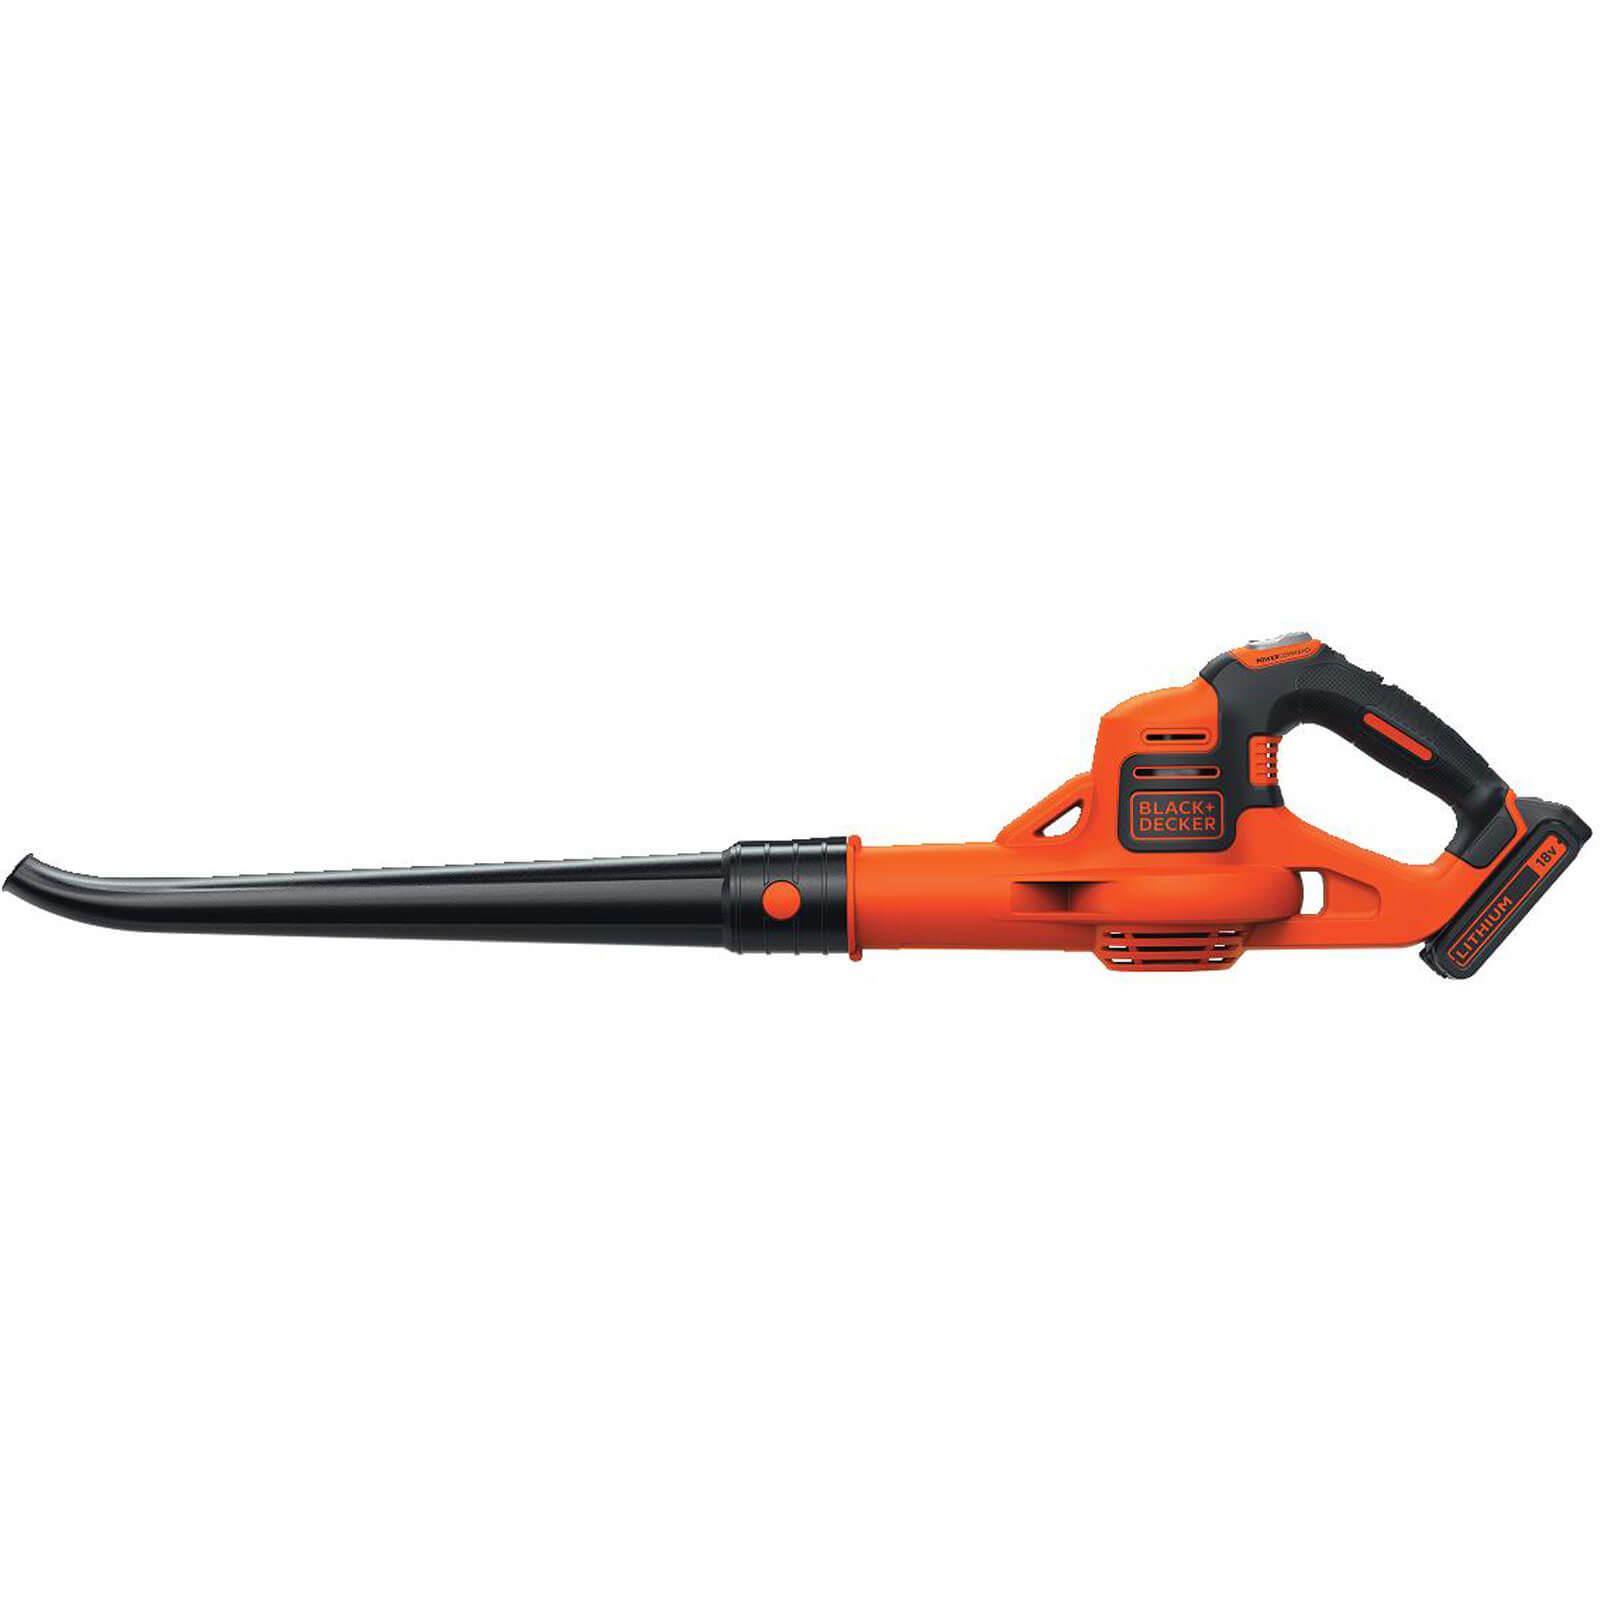 Black & Decker GWC1820PC 18v Cordless Vacuum & Leaf Blower 1 x 2ah Liion Charger